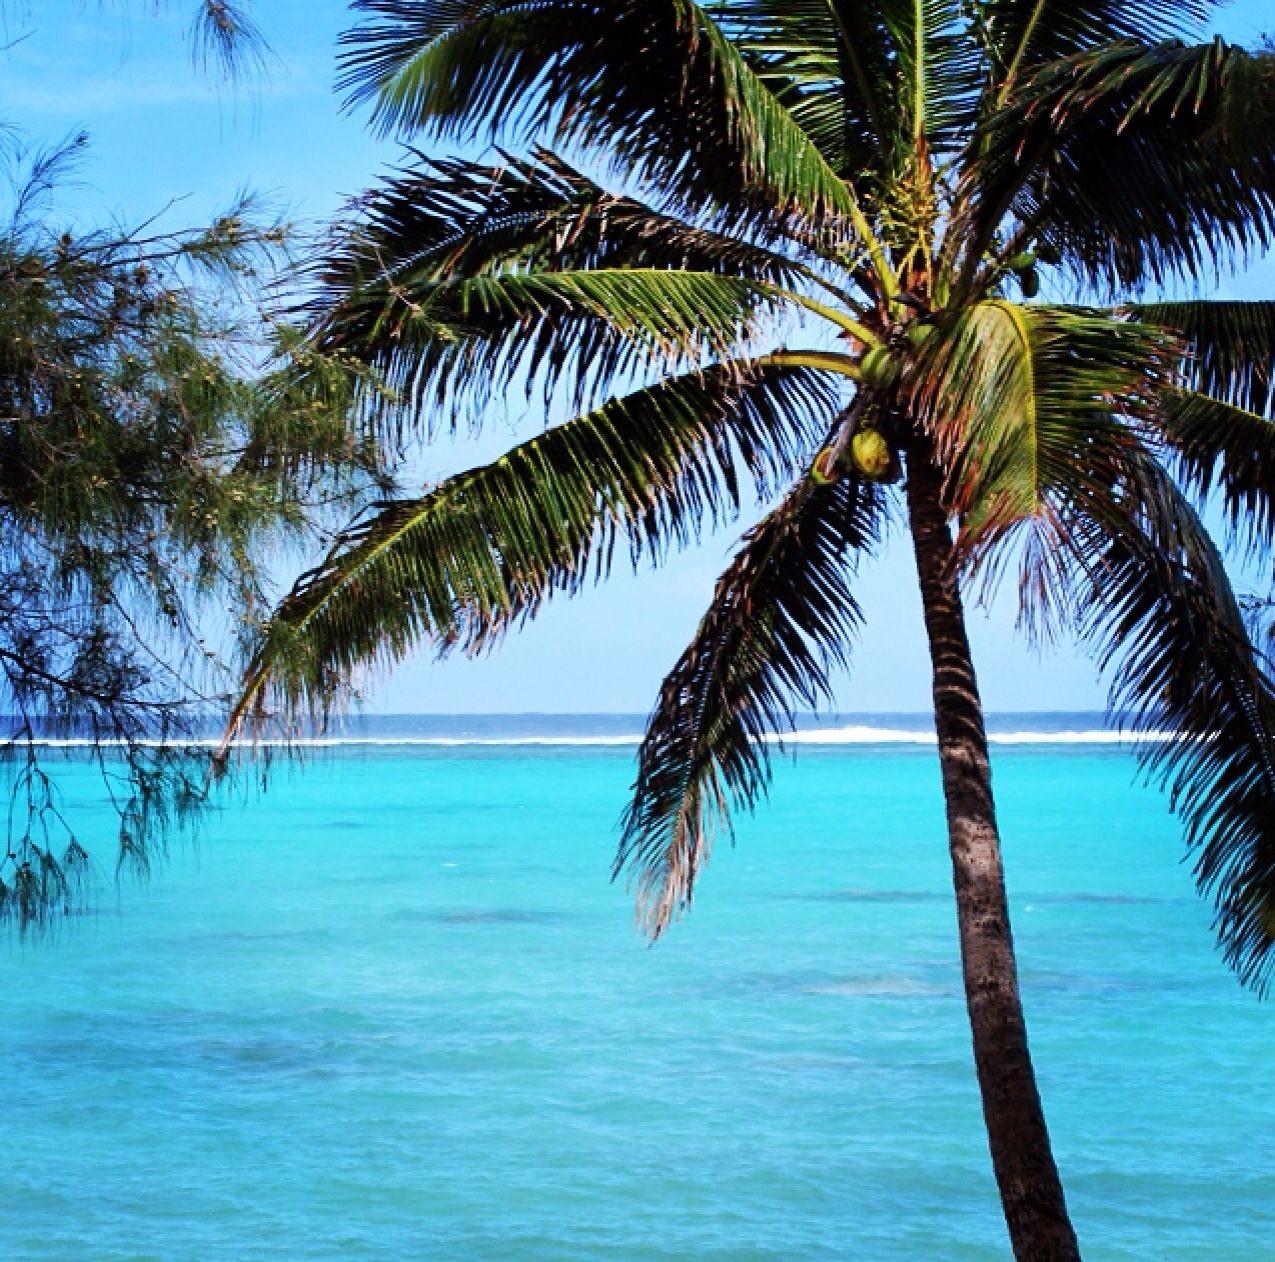 Cook Islands Rarotonga Beach: Cook Islands, Rarotonga Cook Islands, Island